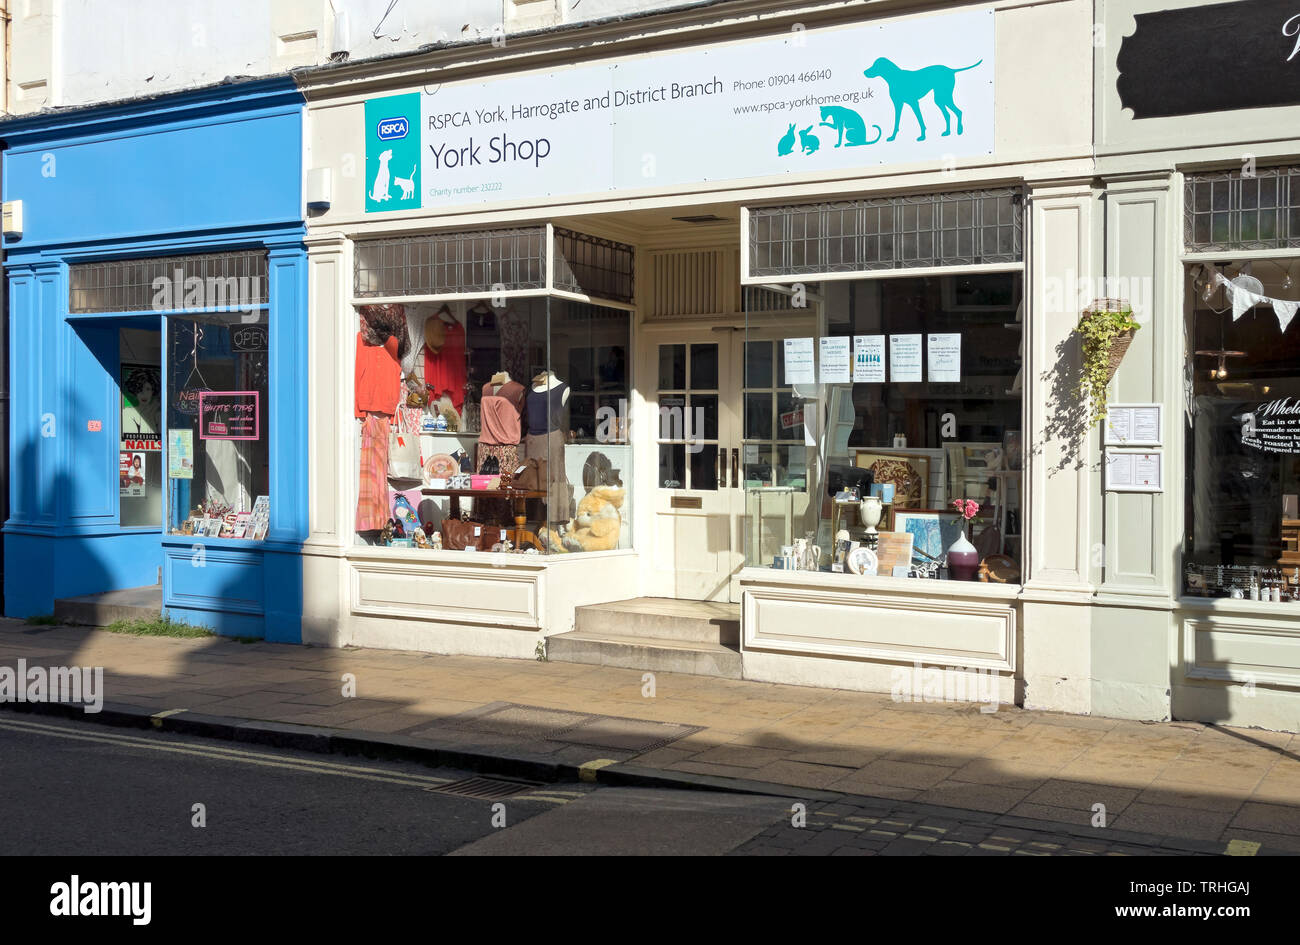 RSPCA charity shop store York North Yorkshire England UK United Kingdom GB Great Britain - Stock Image